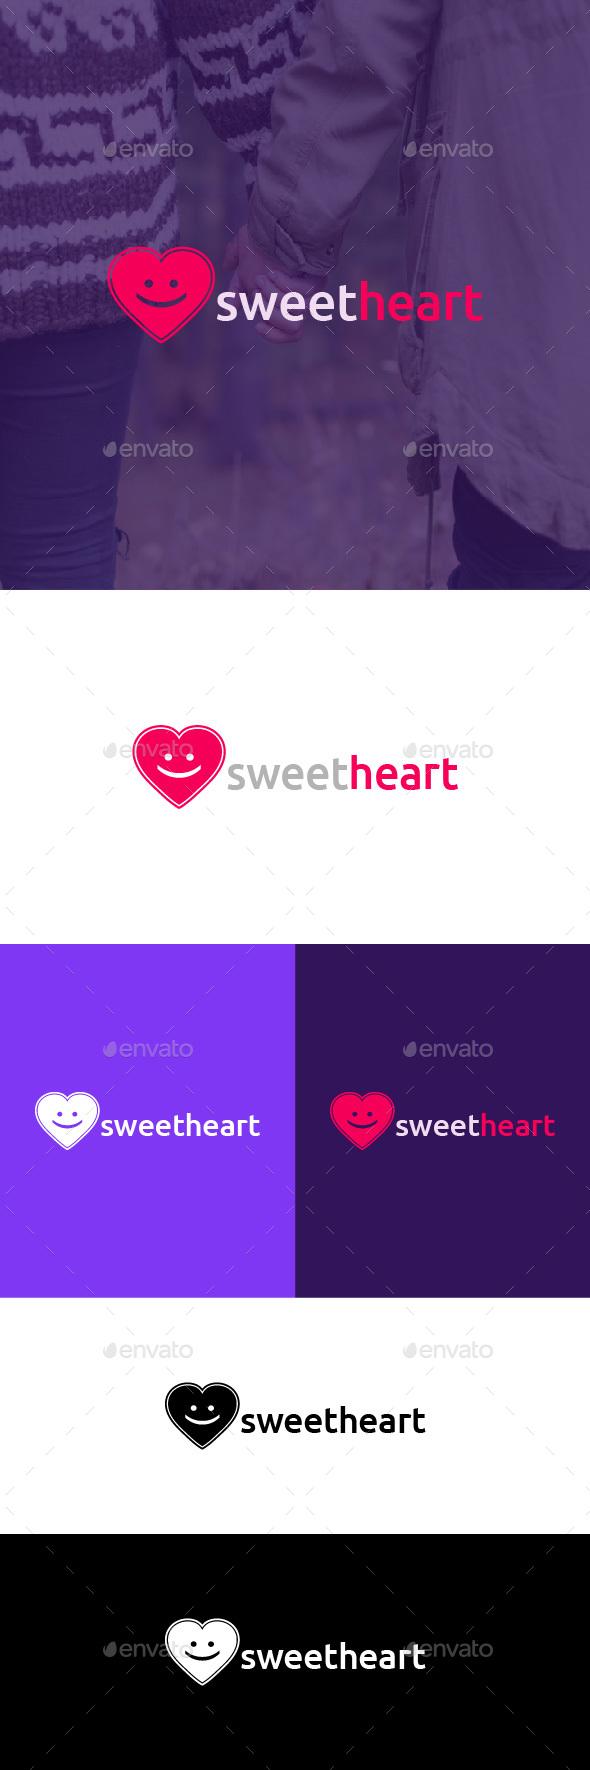 Sweetheart Logo Template